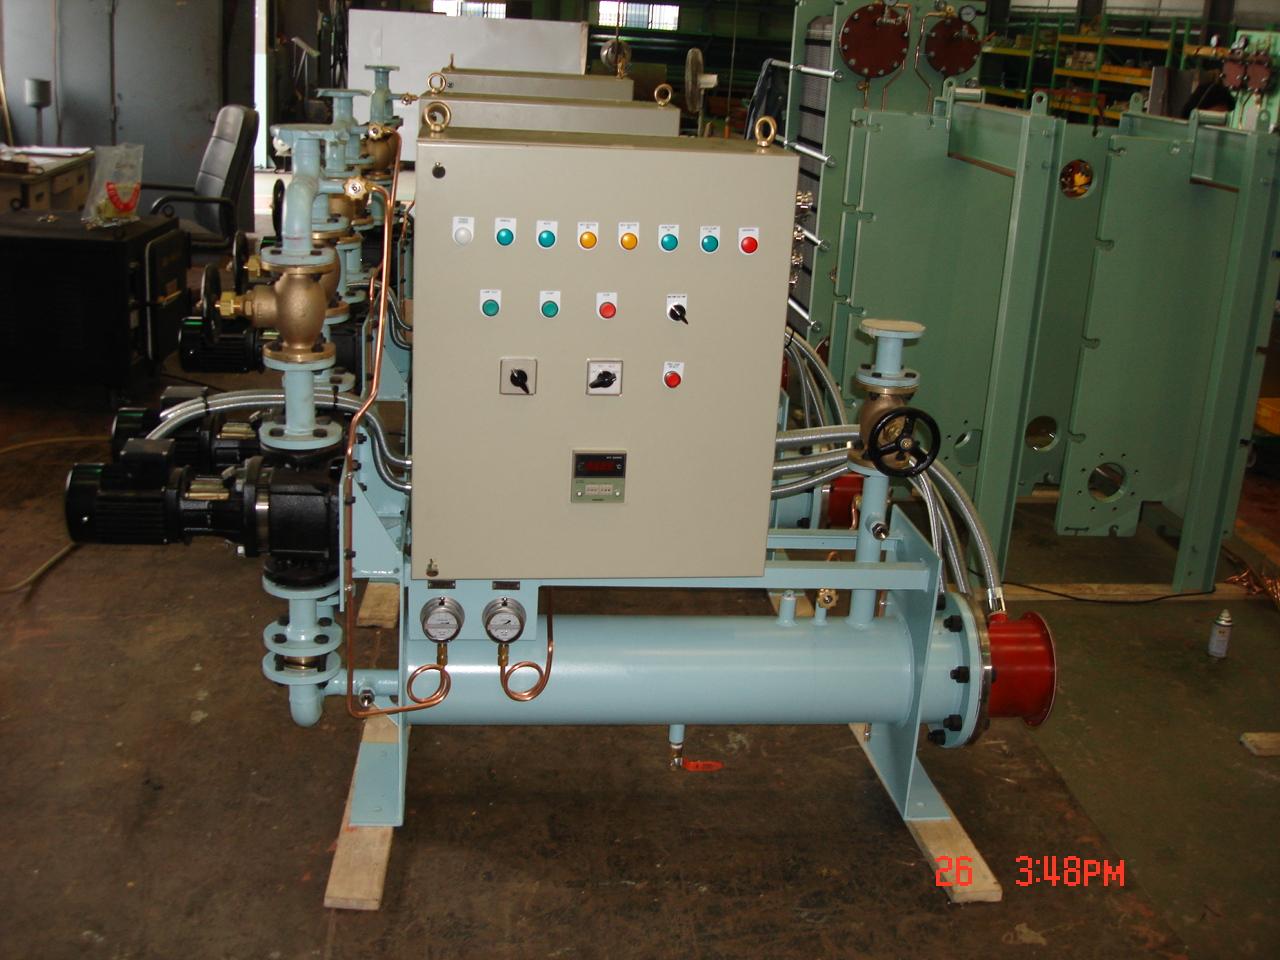 2.9. Electric Heater (1)